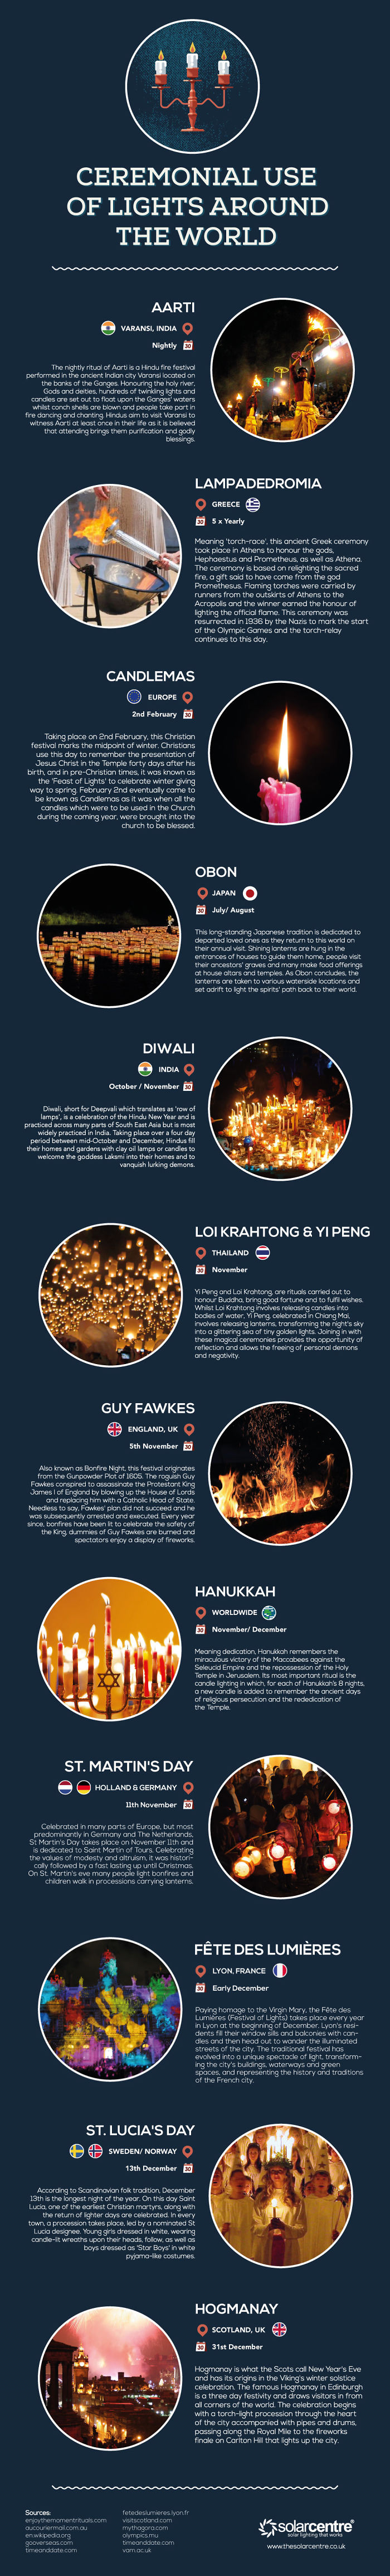 Ceremonial Use Of Lights Around The World